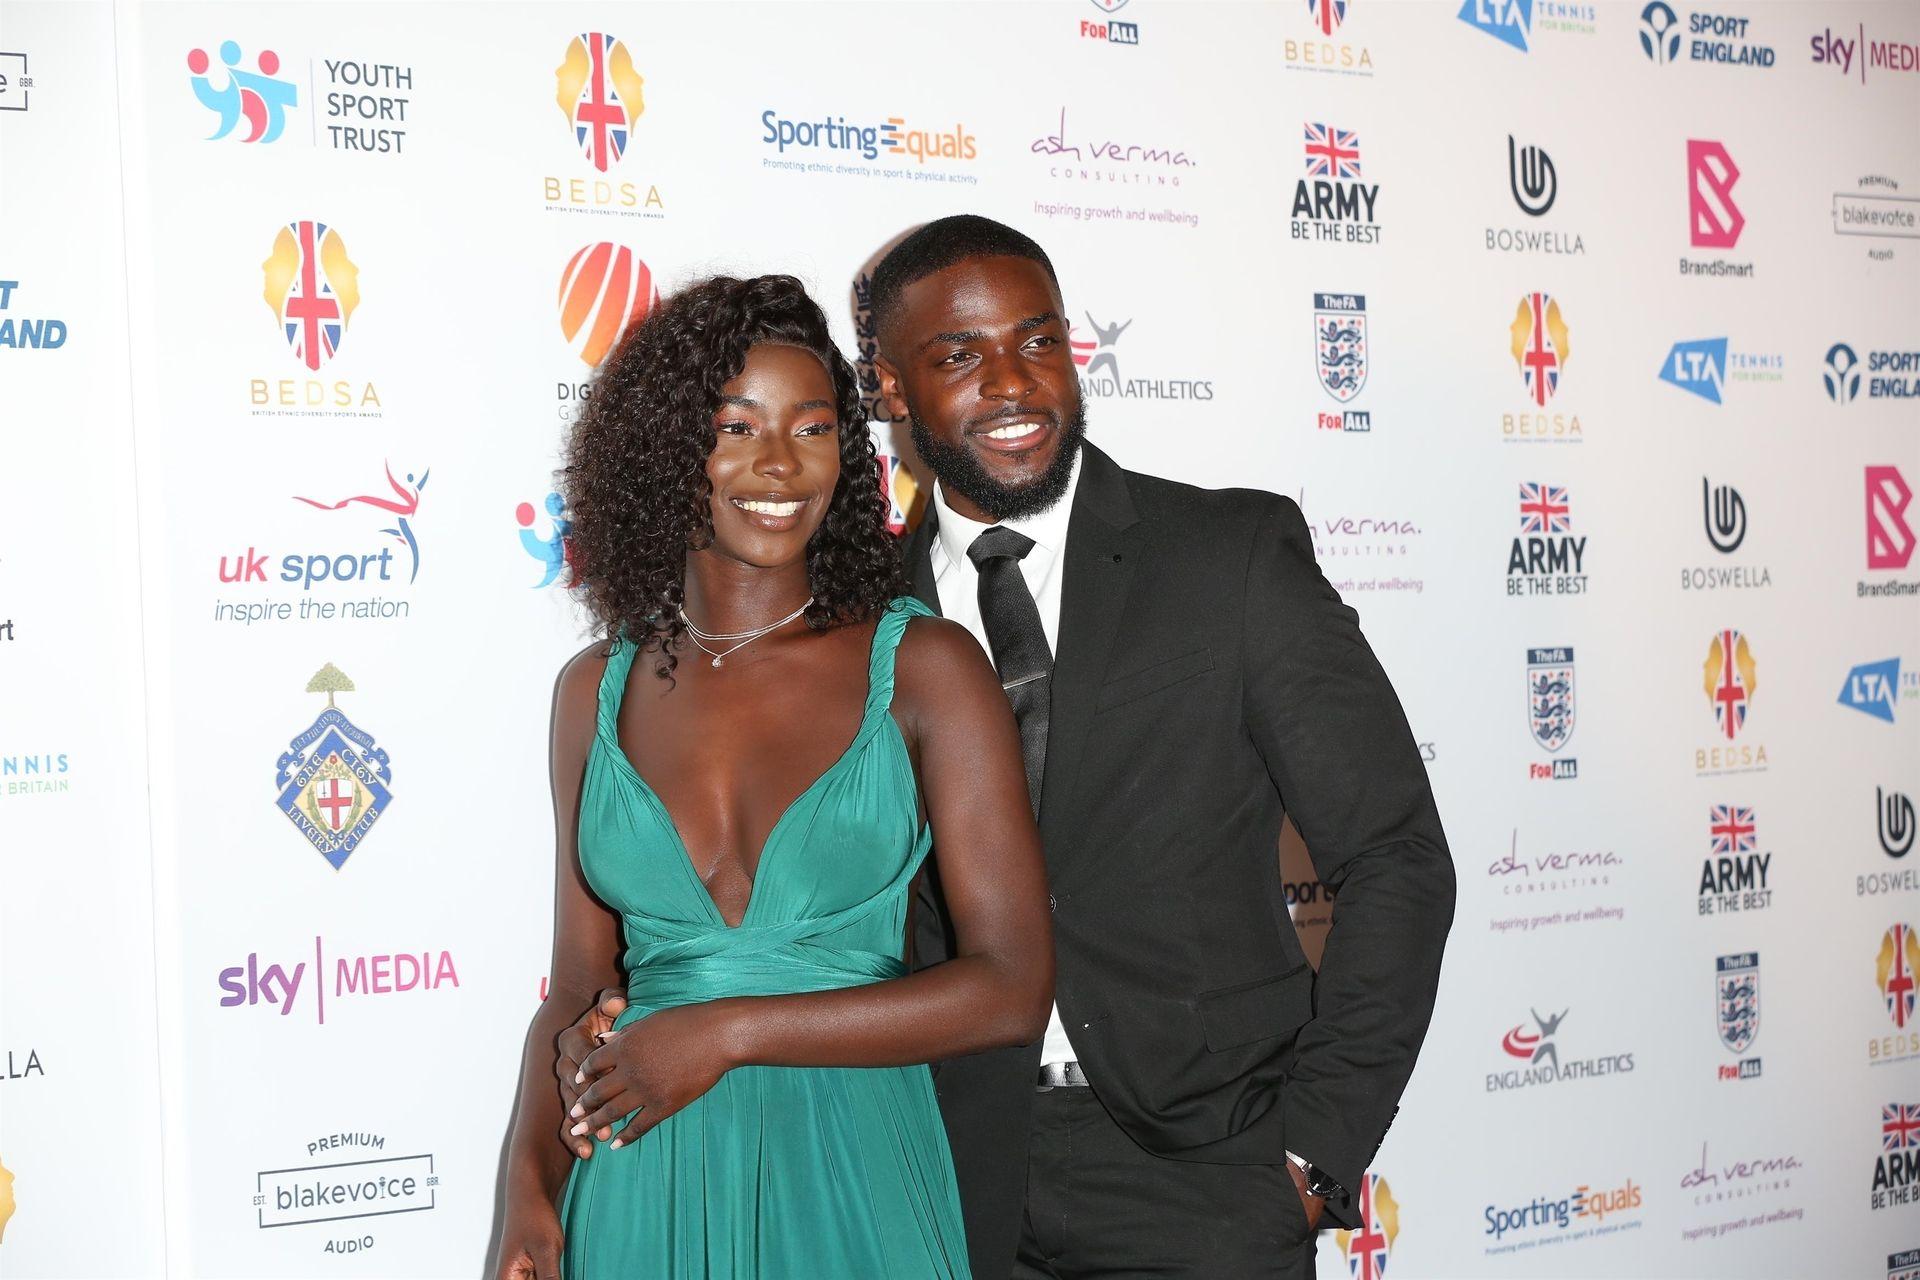 Mike Boateng & Priscilla Anyabu Are Seen At British Ethnic Diversity Sports Awards 0055